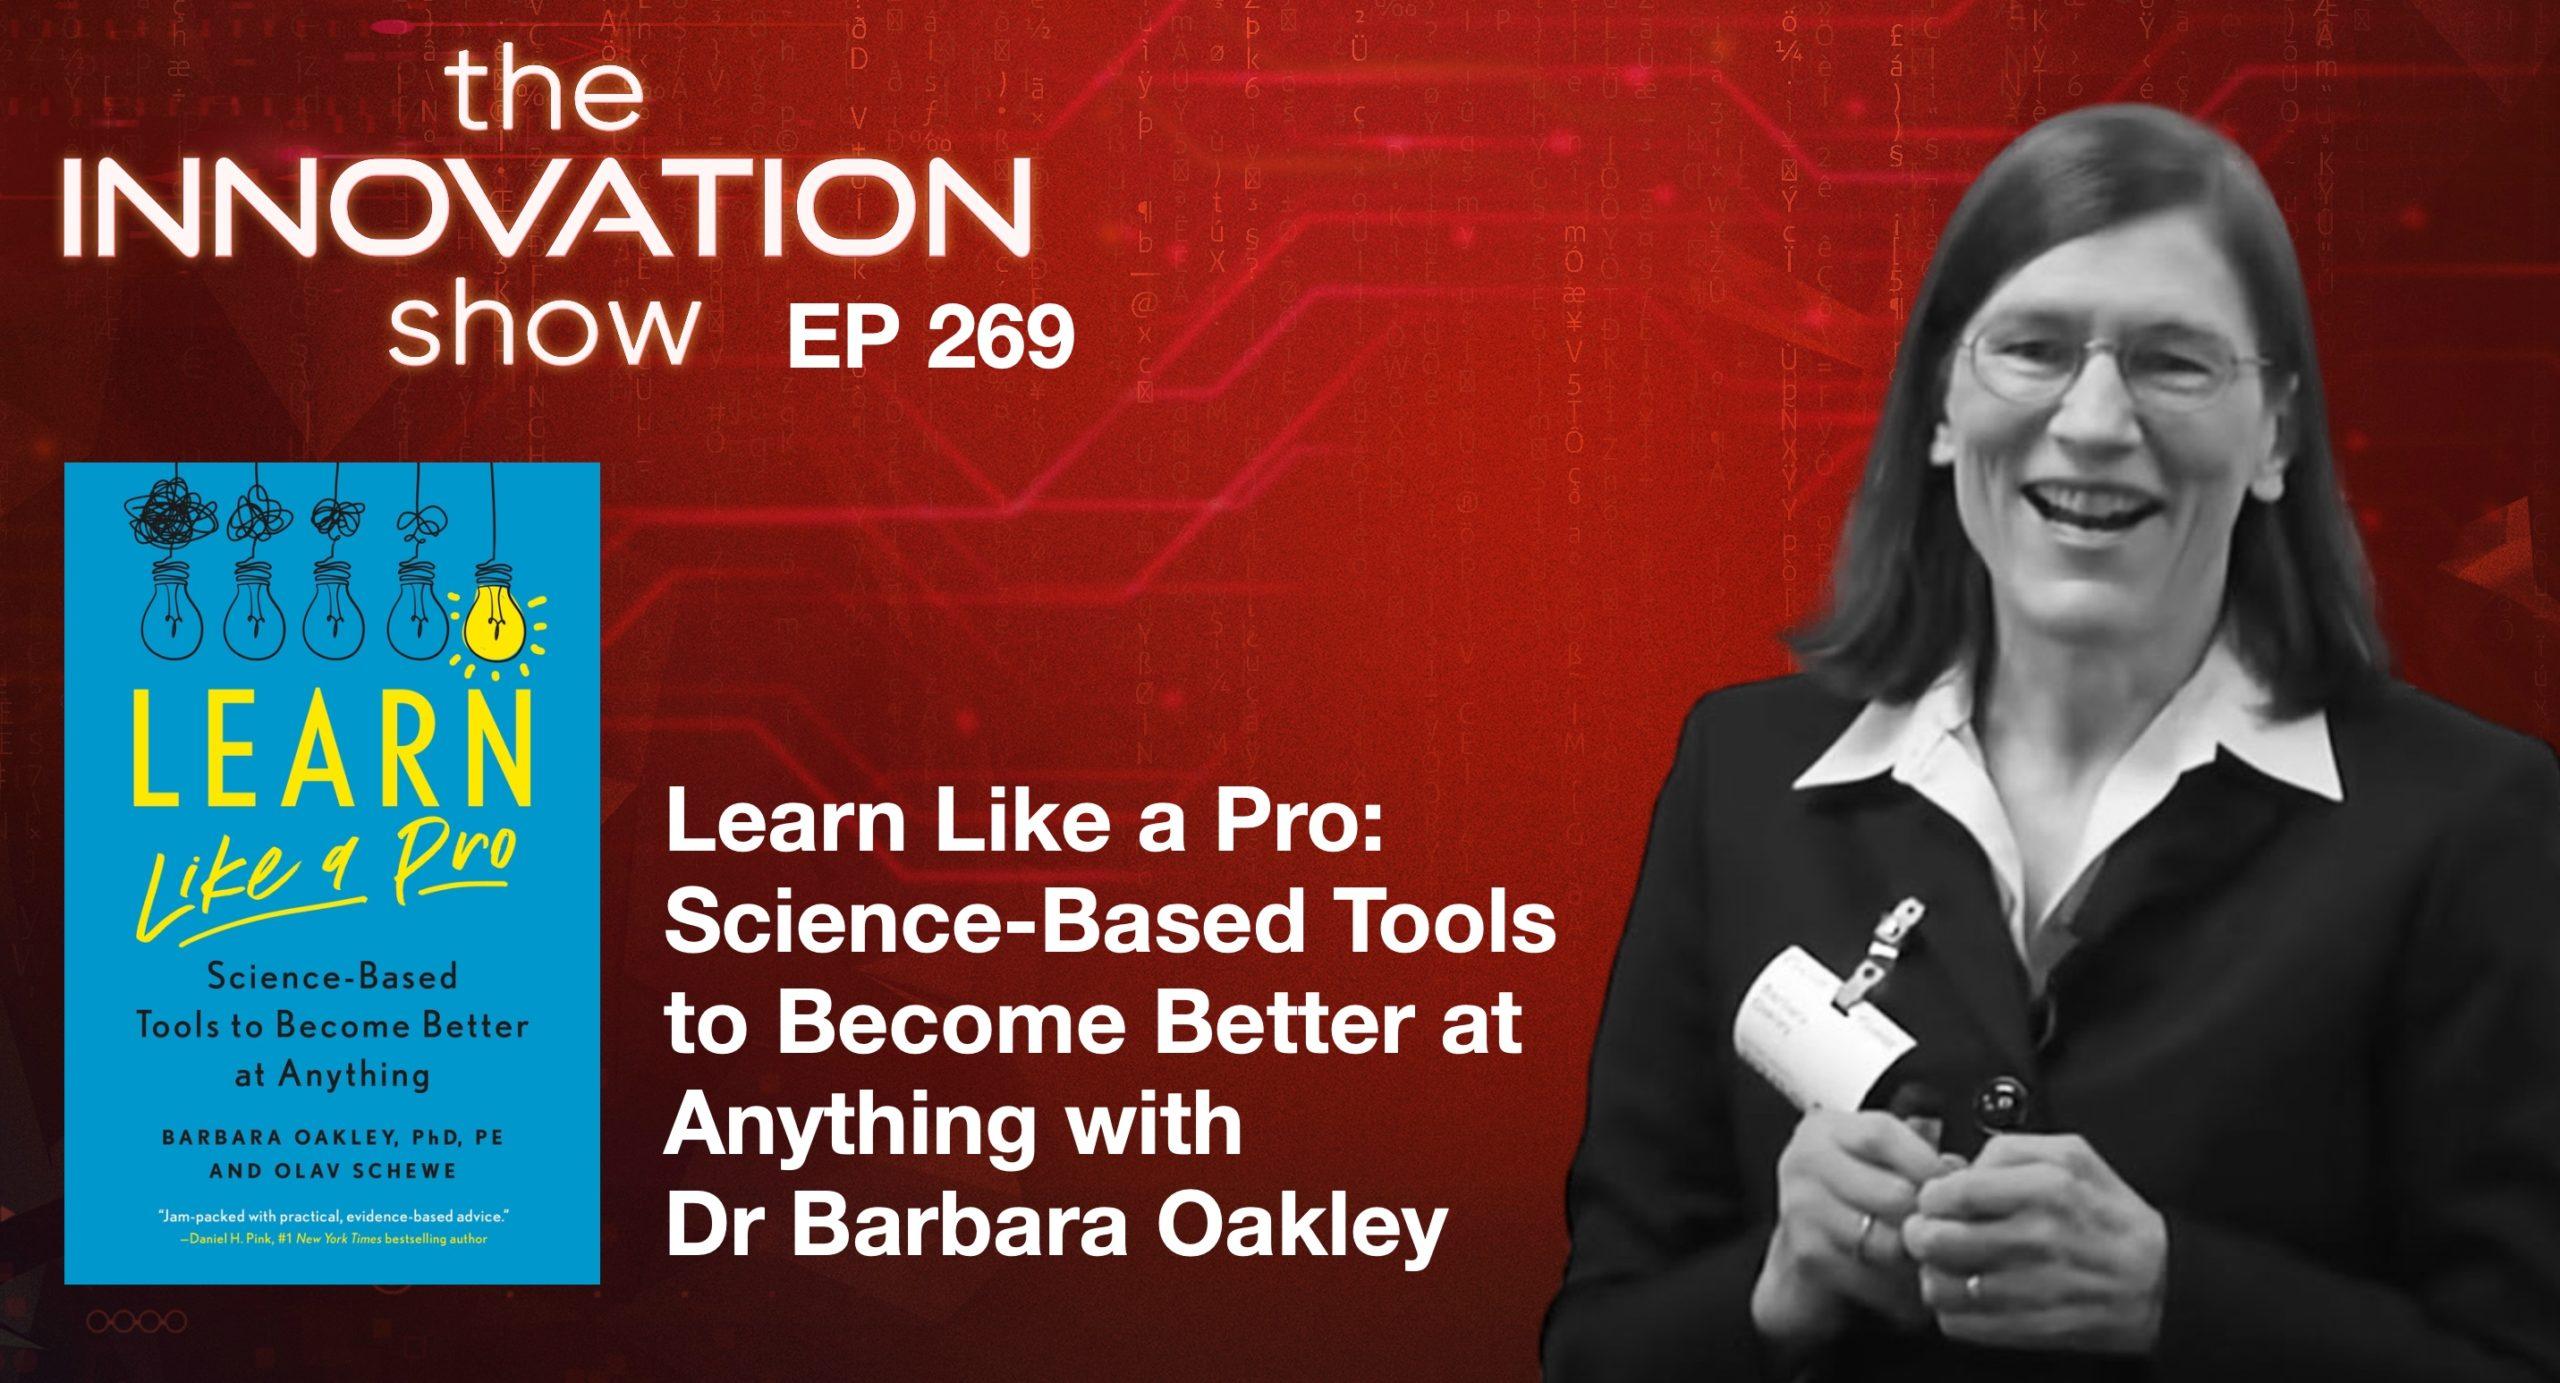 Barbara Oakley Innovation Show